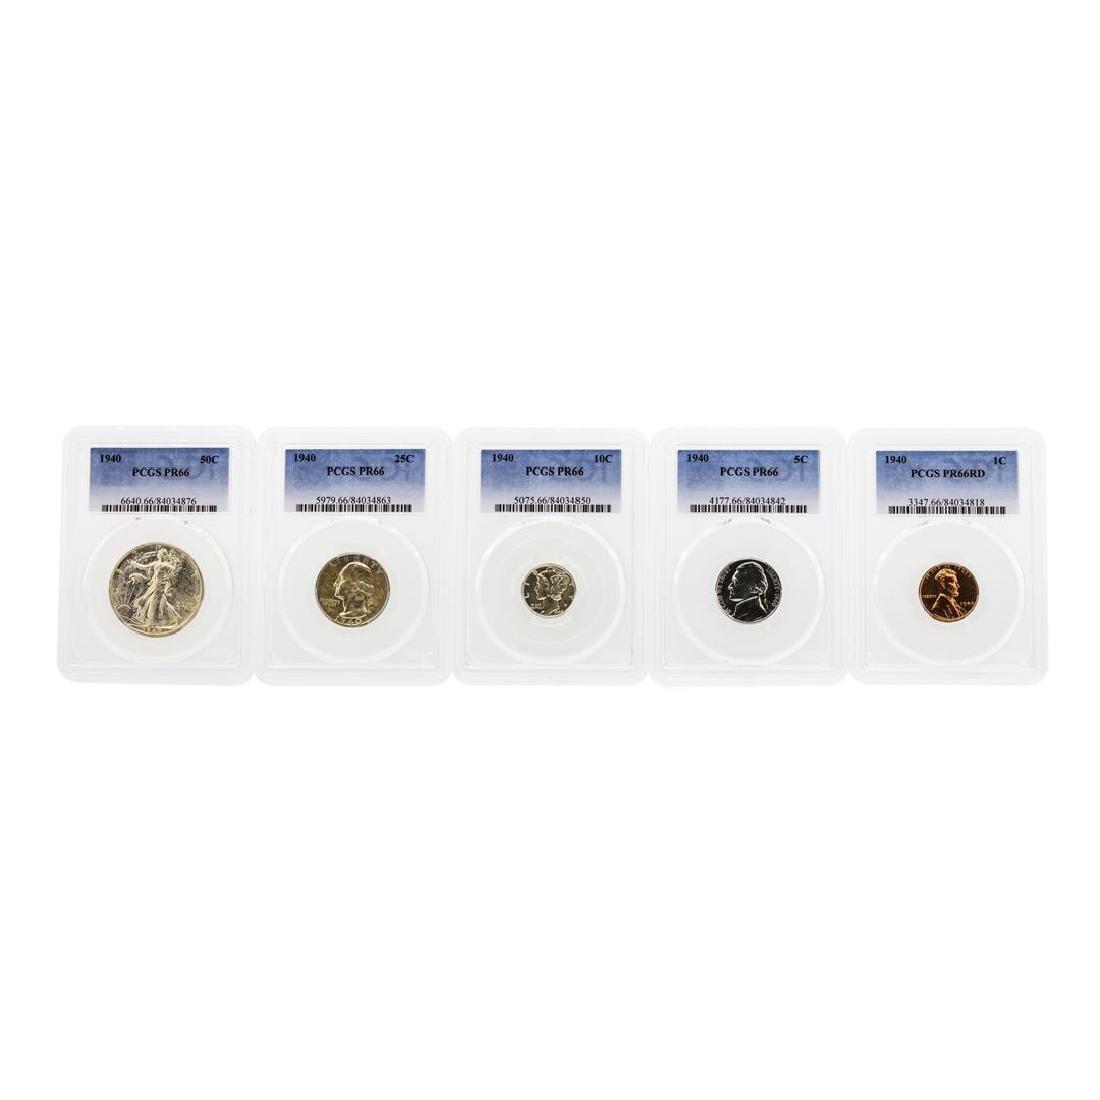 1940 (5) Coin Proof Set PCGS PR66